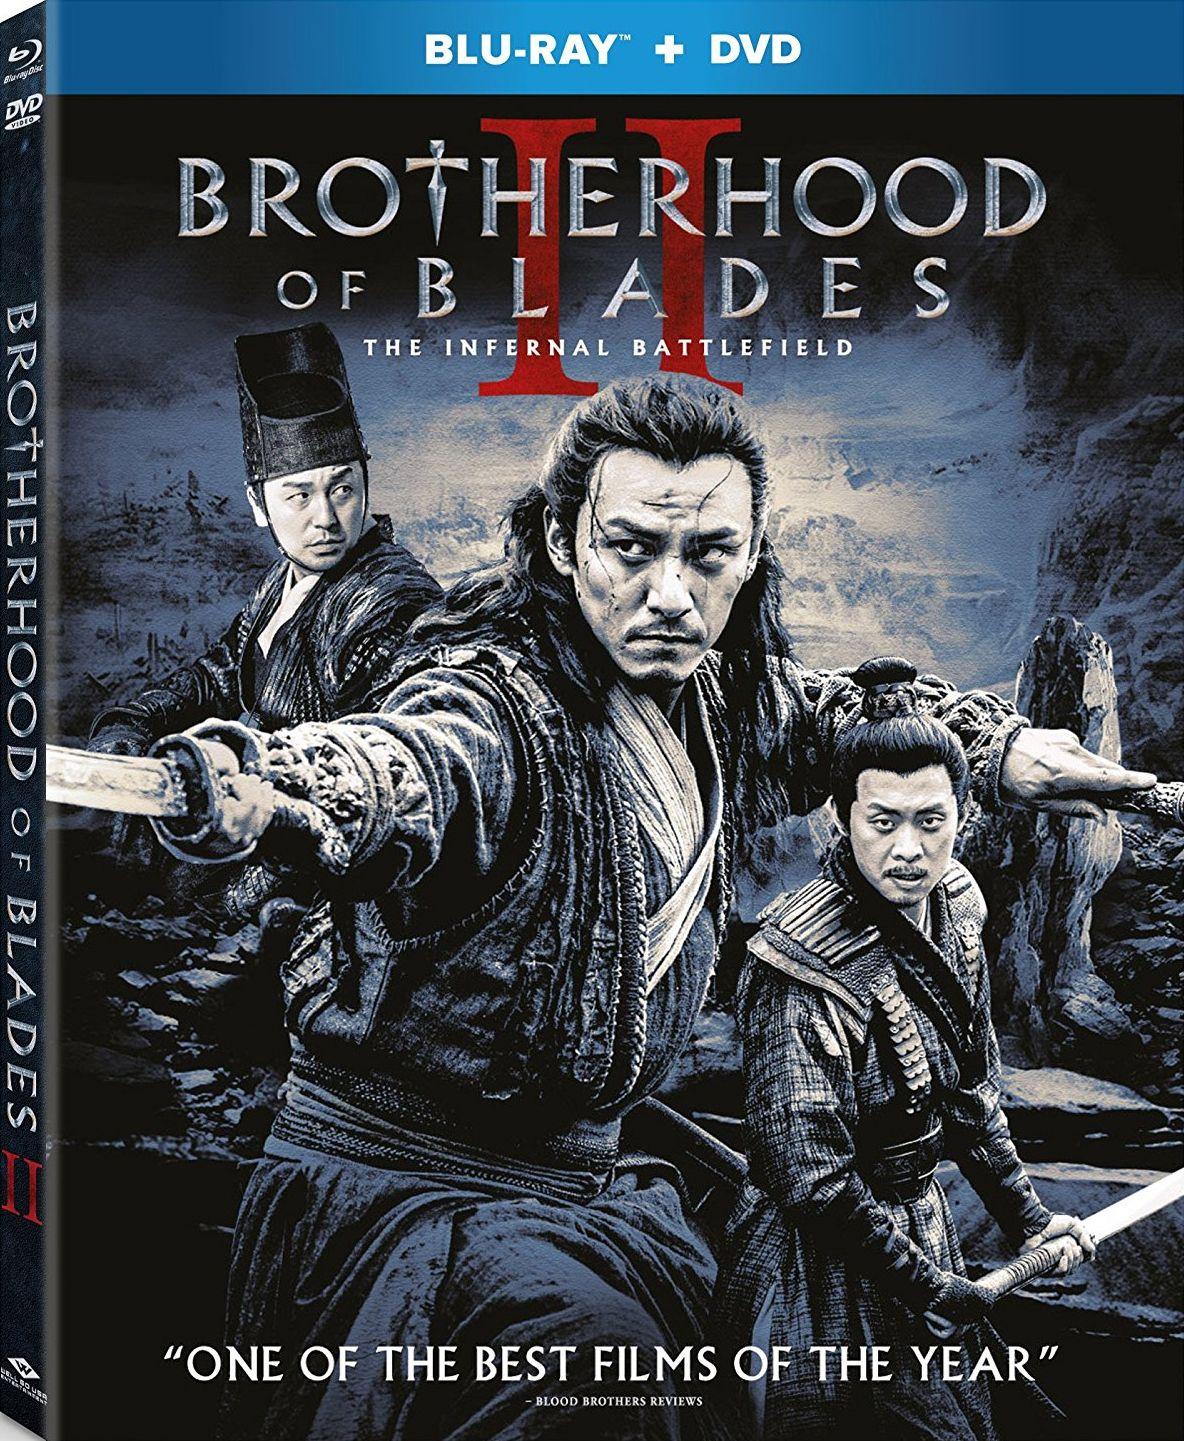 Brotherhood of blades ii the infernal battlefield bluray